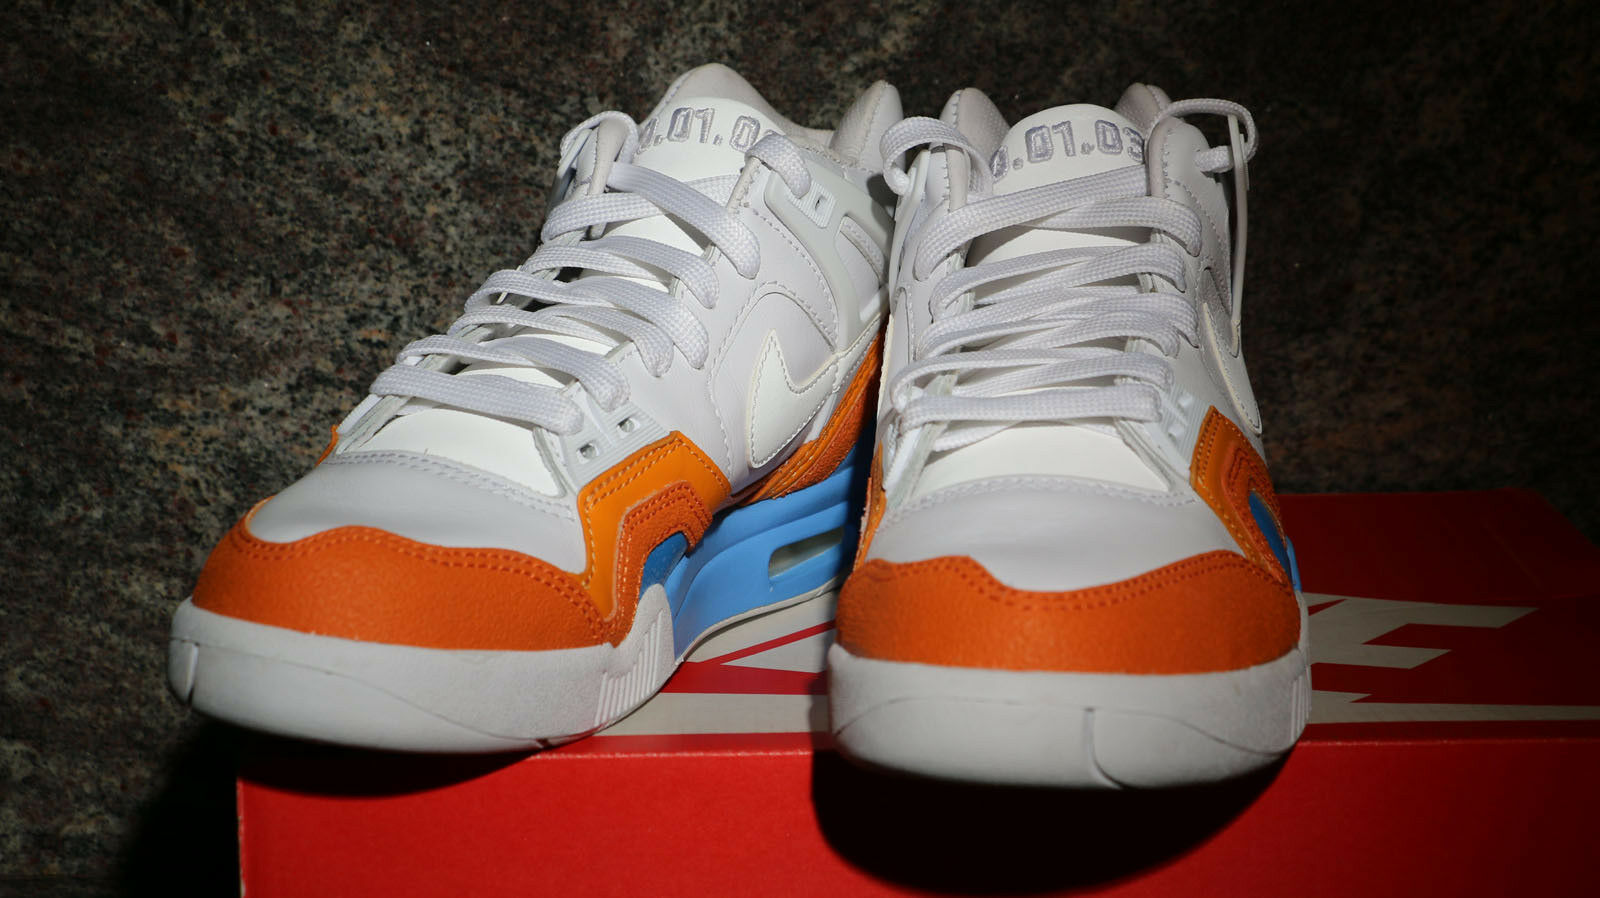 Nike air tech challenge ii sp open di australia bianca vivida blu 621358-100 sz